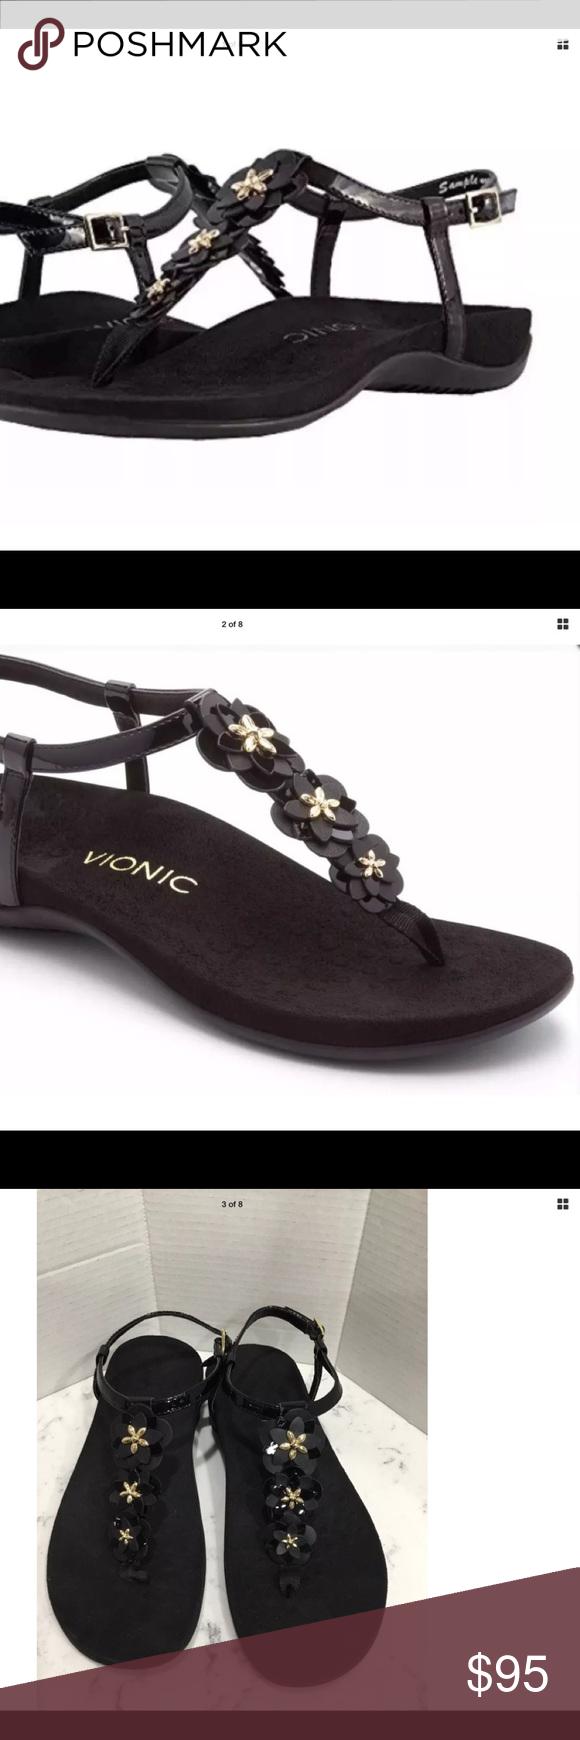 e02fbf0477ce Vionic Women s Paulie T-Strap Sandal Black Patent Vionic Women s Paulie T-Strap  Sandal Black Patent Size 8.5 M New without Box Durable rubber outsole with  ...